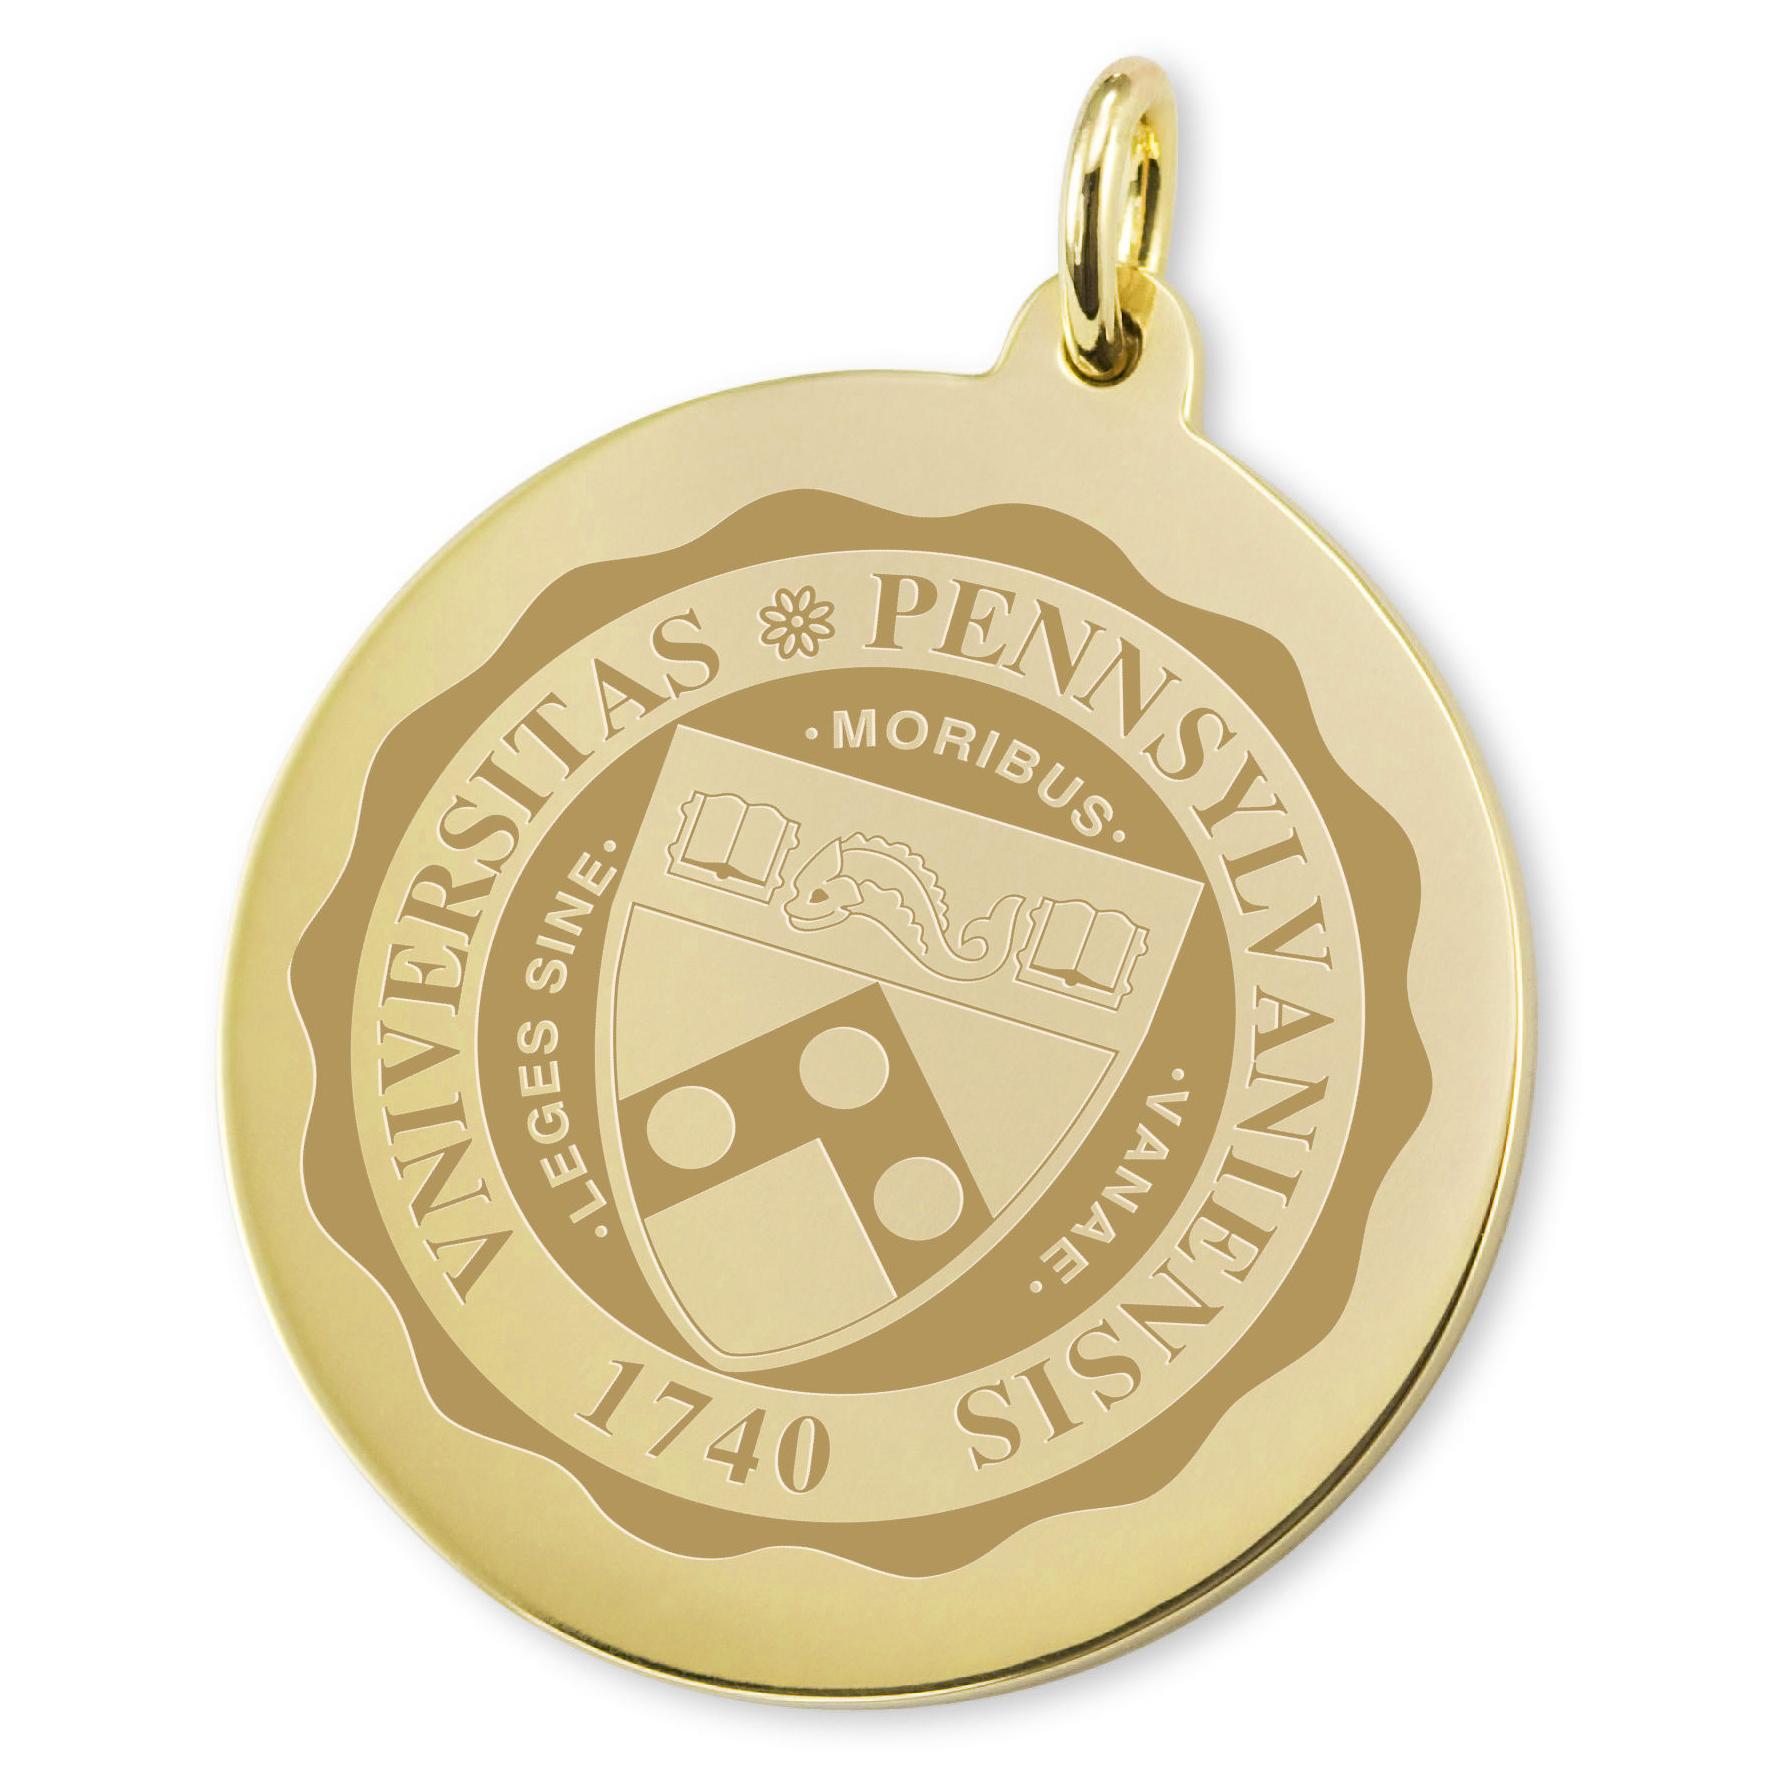 Penn 14K Gold Charm - Image 2